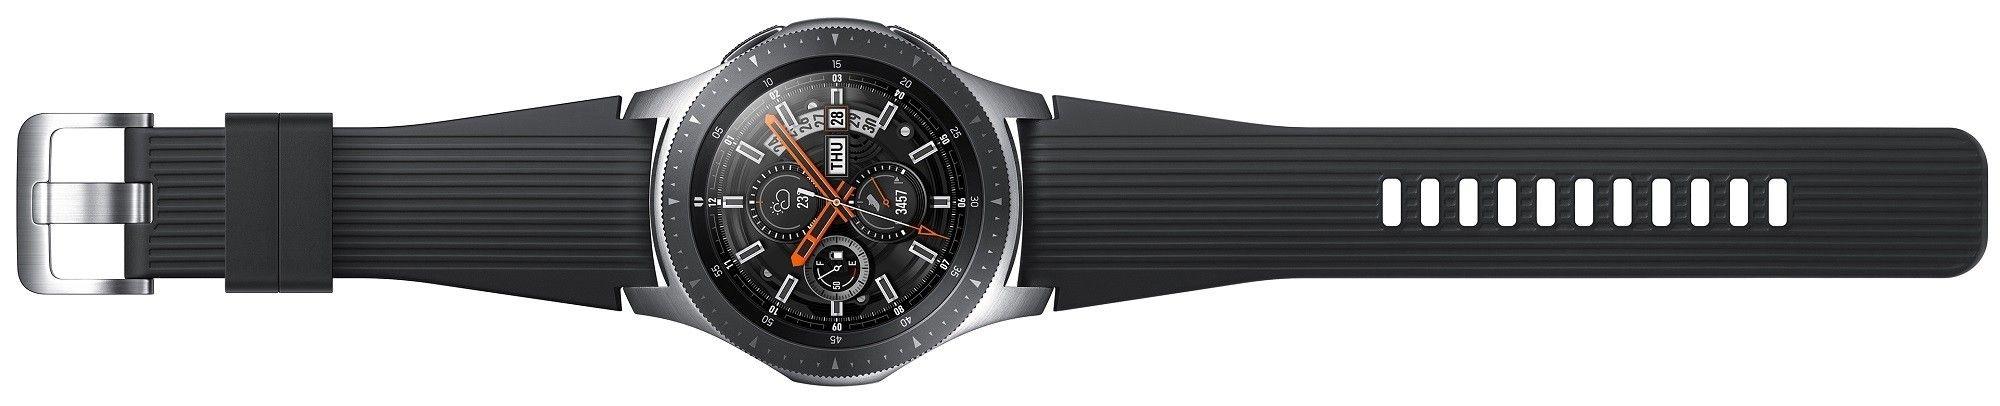 Смарт часы Samsung Galaxy Watch 46mm (SM-R800NZSASEK) Silver от Територія твоєї техніки - 6